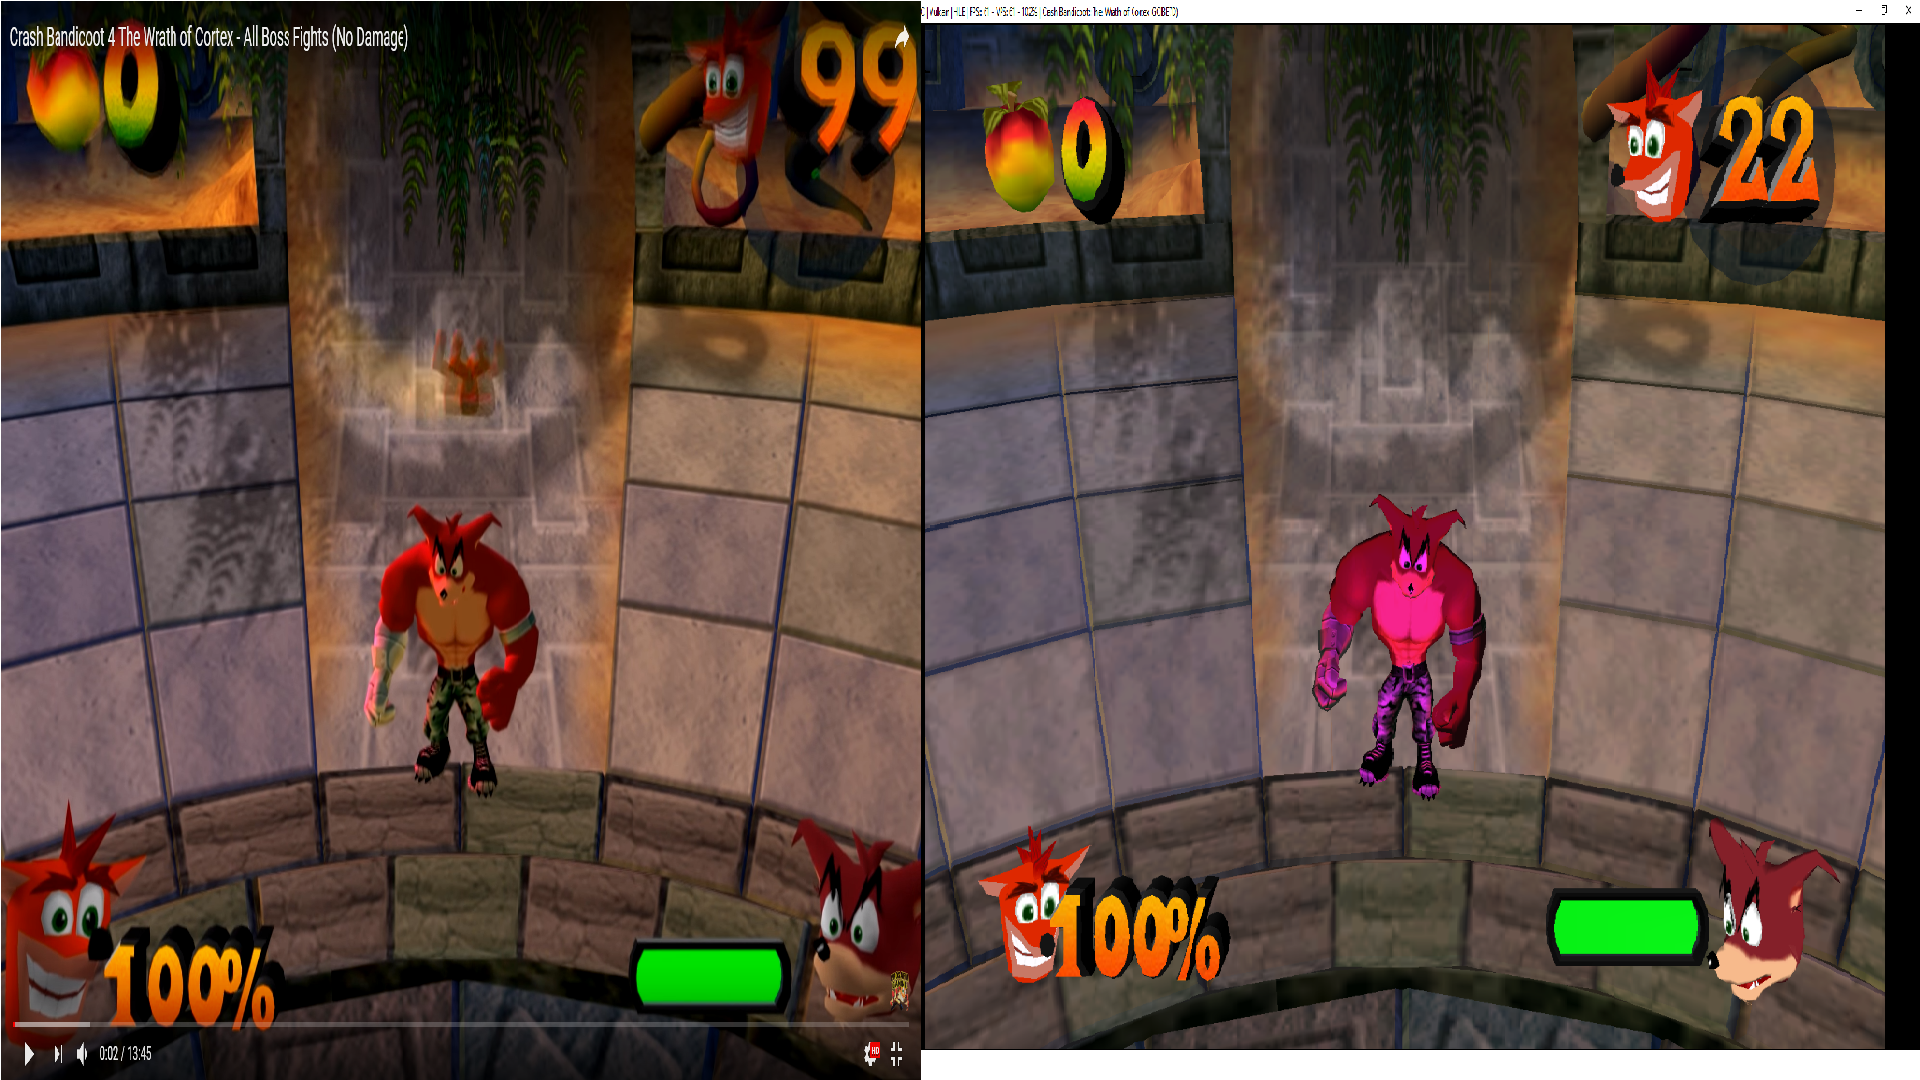 crash bandicoot emulator online